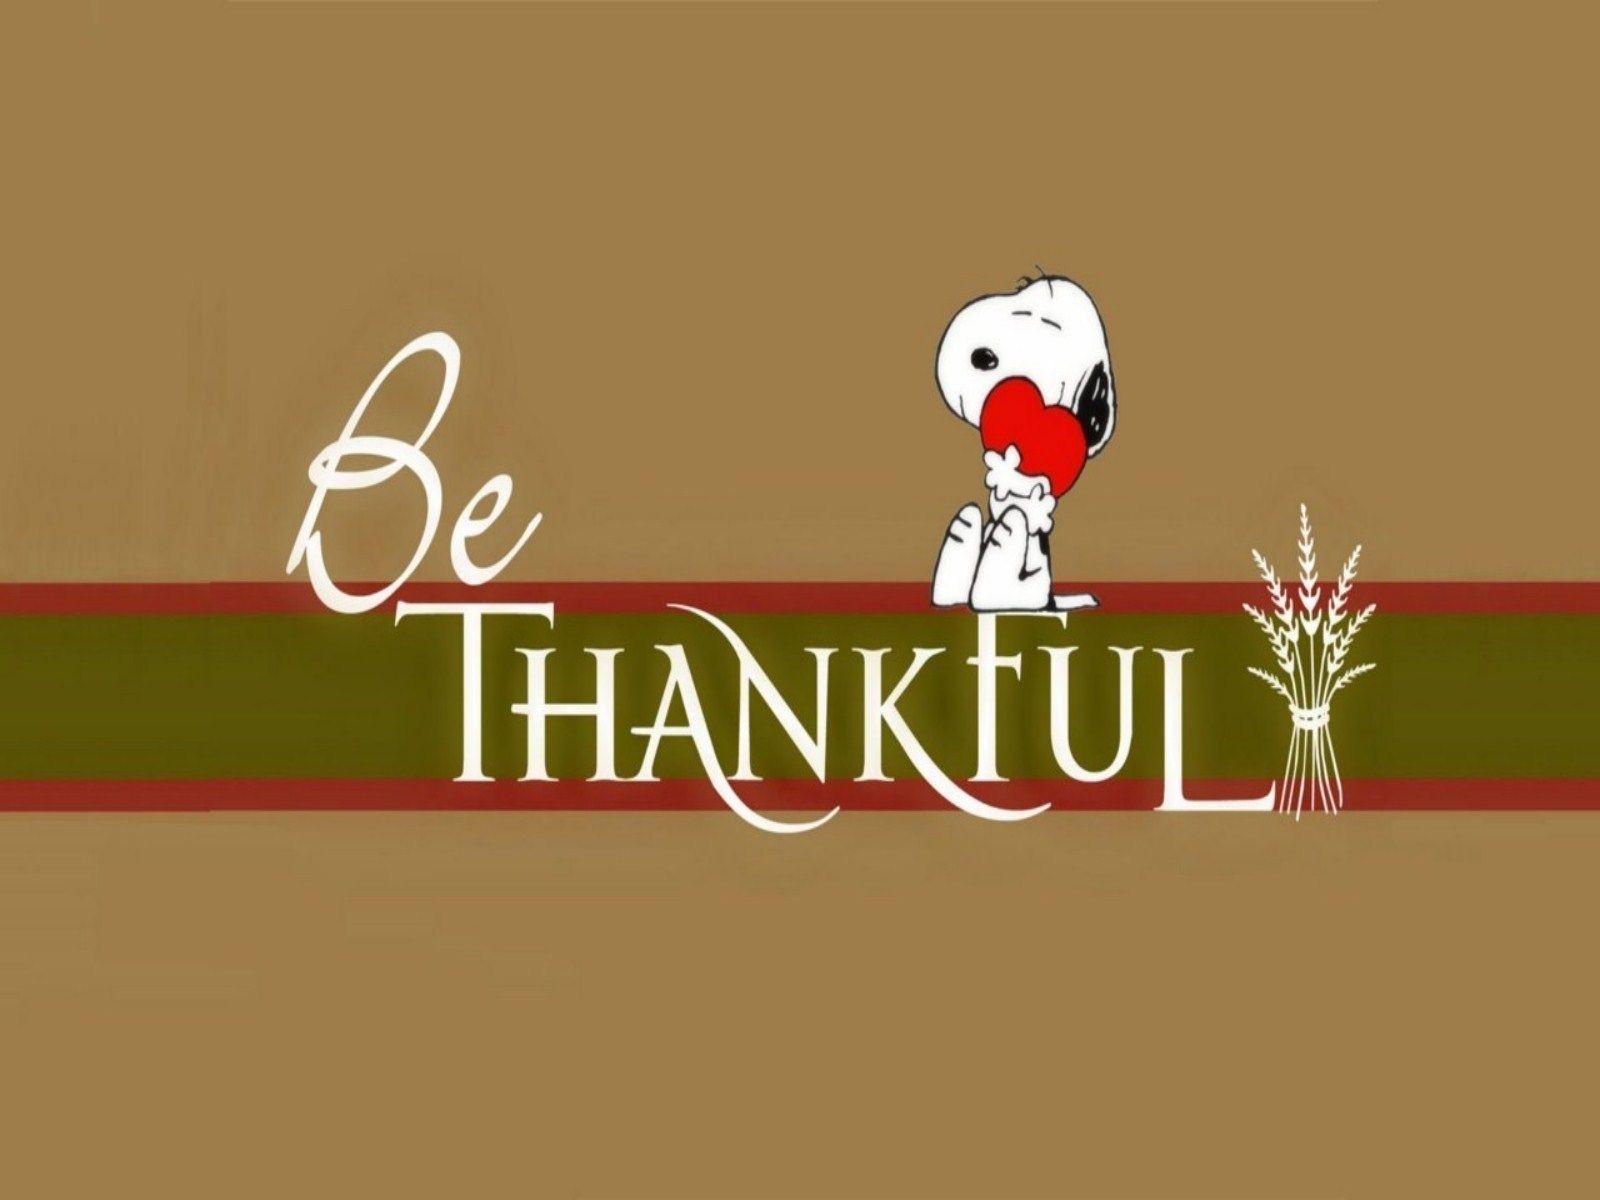 free thanksgiving wallpapers hd & desktop backgrounds   thanksgiving